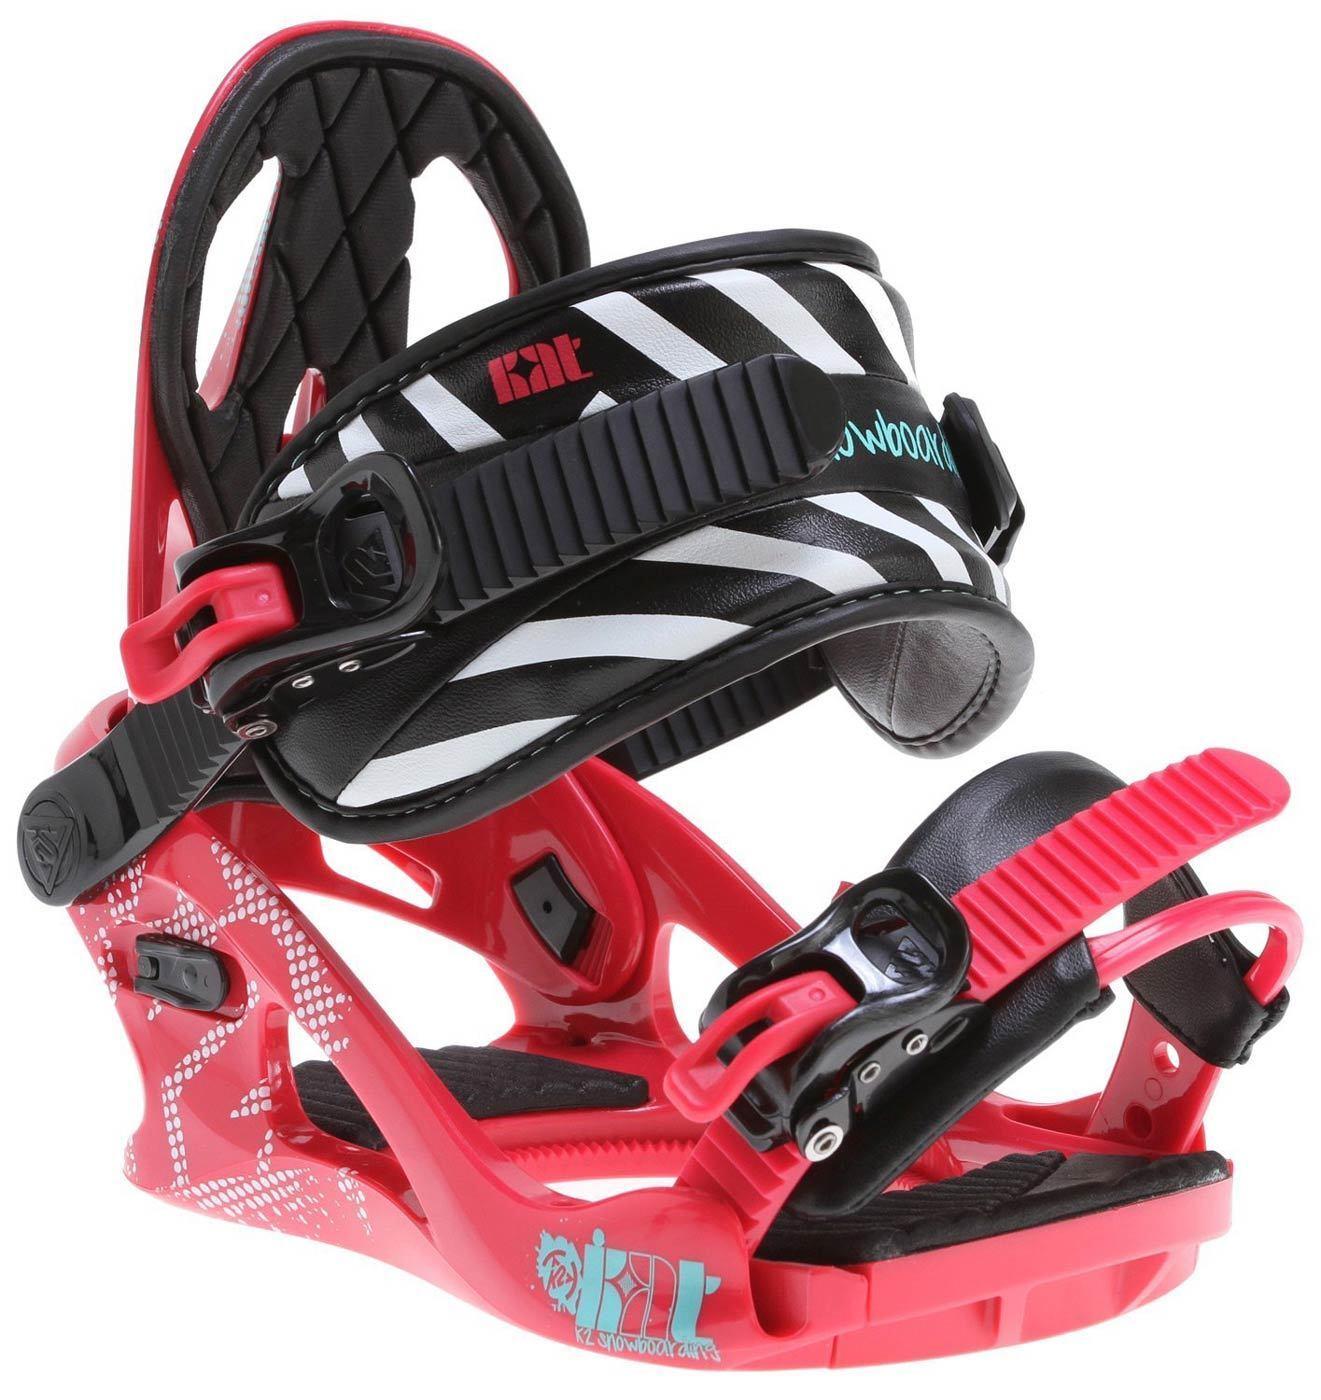 K2 KAT Snowboard Bindung Binding  Pink, Snowboardbindung Size S (33-36)